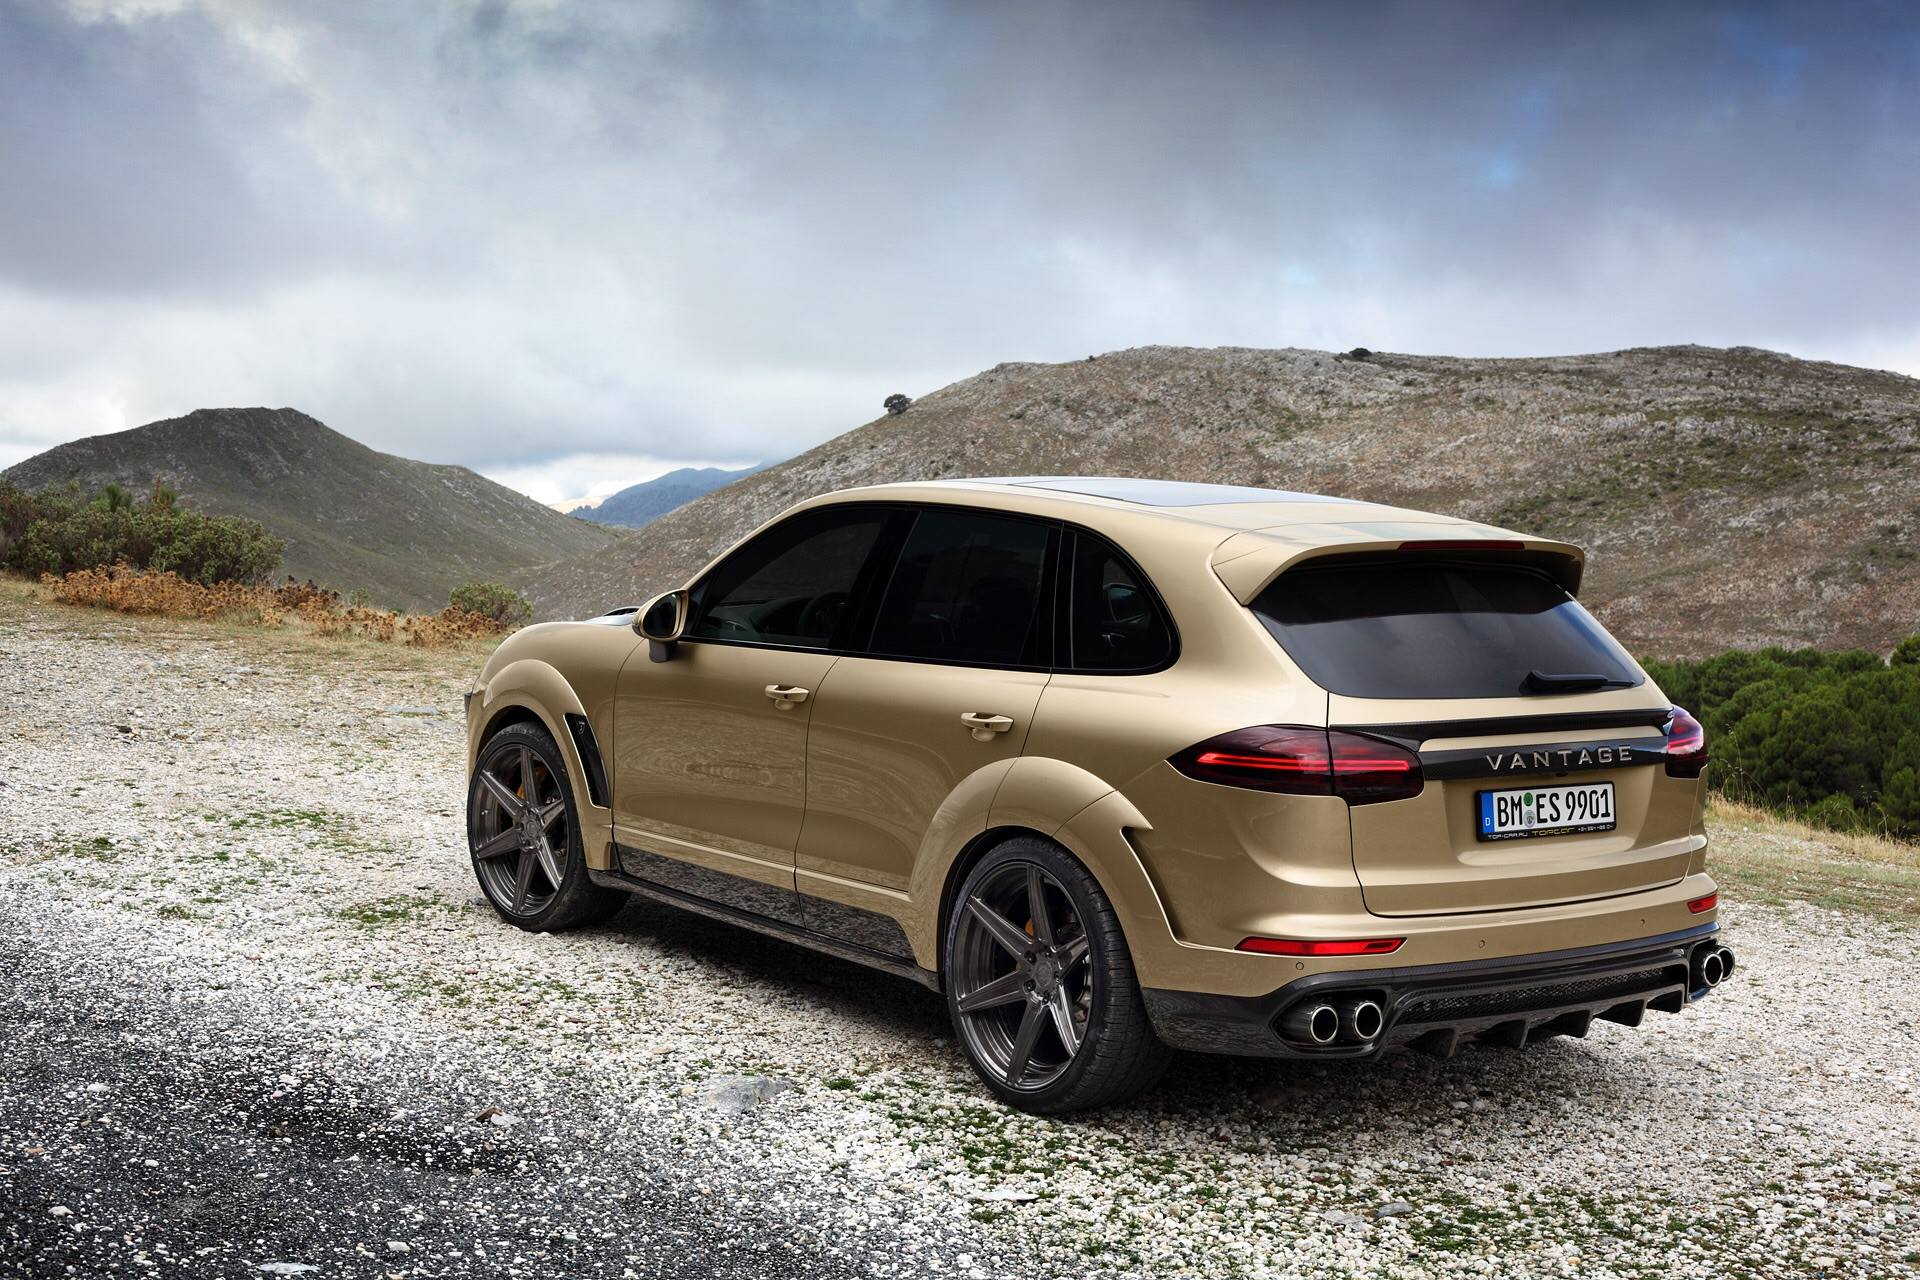 Porsche Cayenne Turbo Gets Topcar Vantage Treatment In Gold Autoevolution